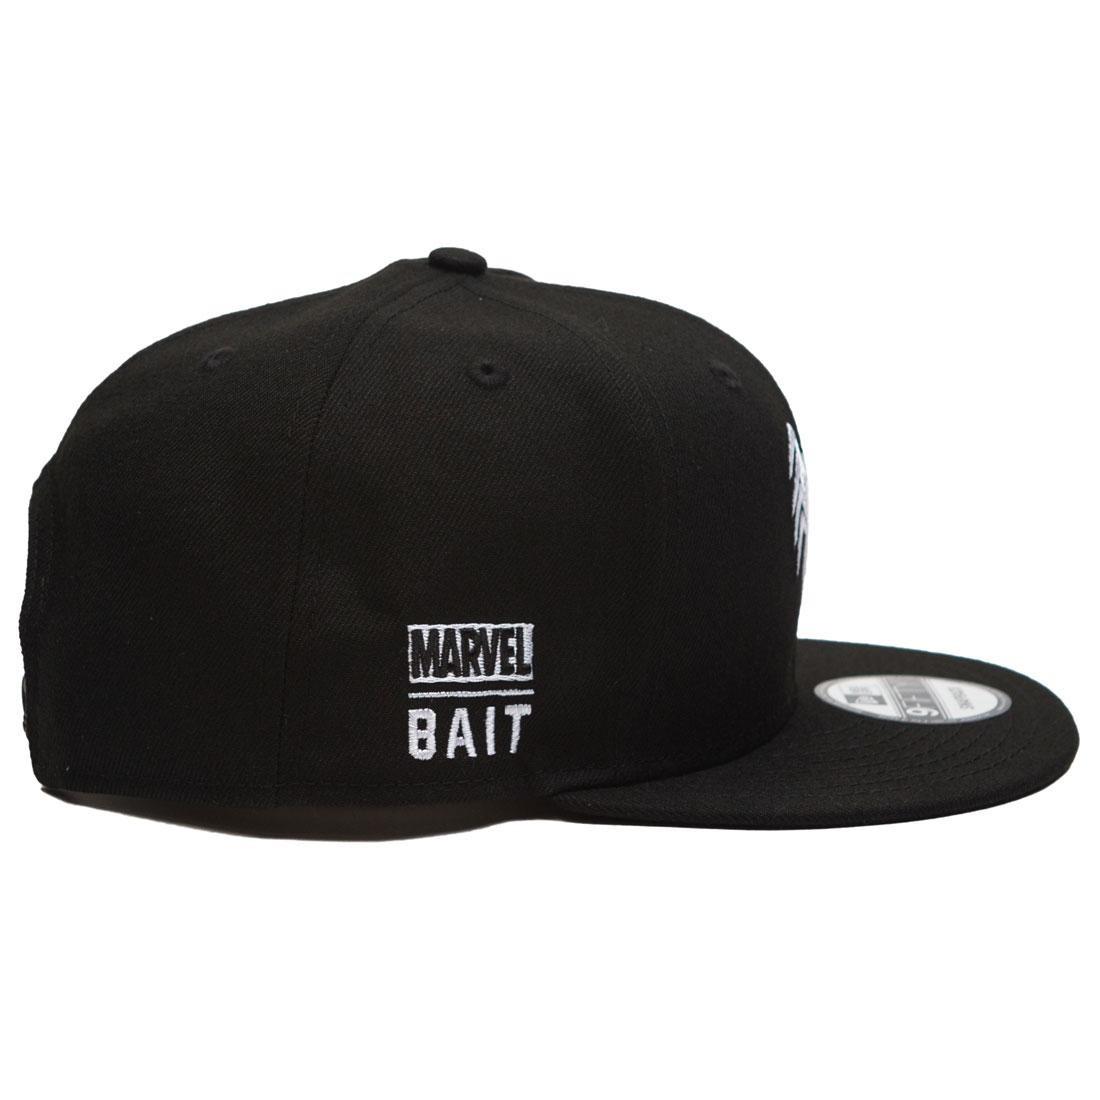 official photos c91c2 e0a48 ... wholesale bait x marvel x new era 9fifty venom logo black snapback cap  black 793b4 5d3a1